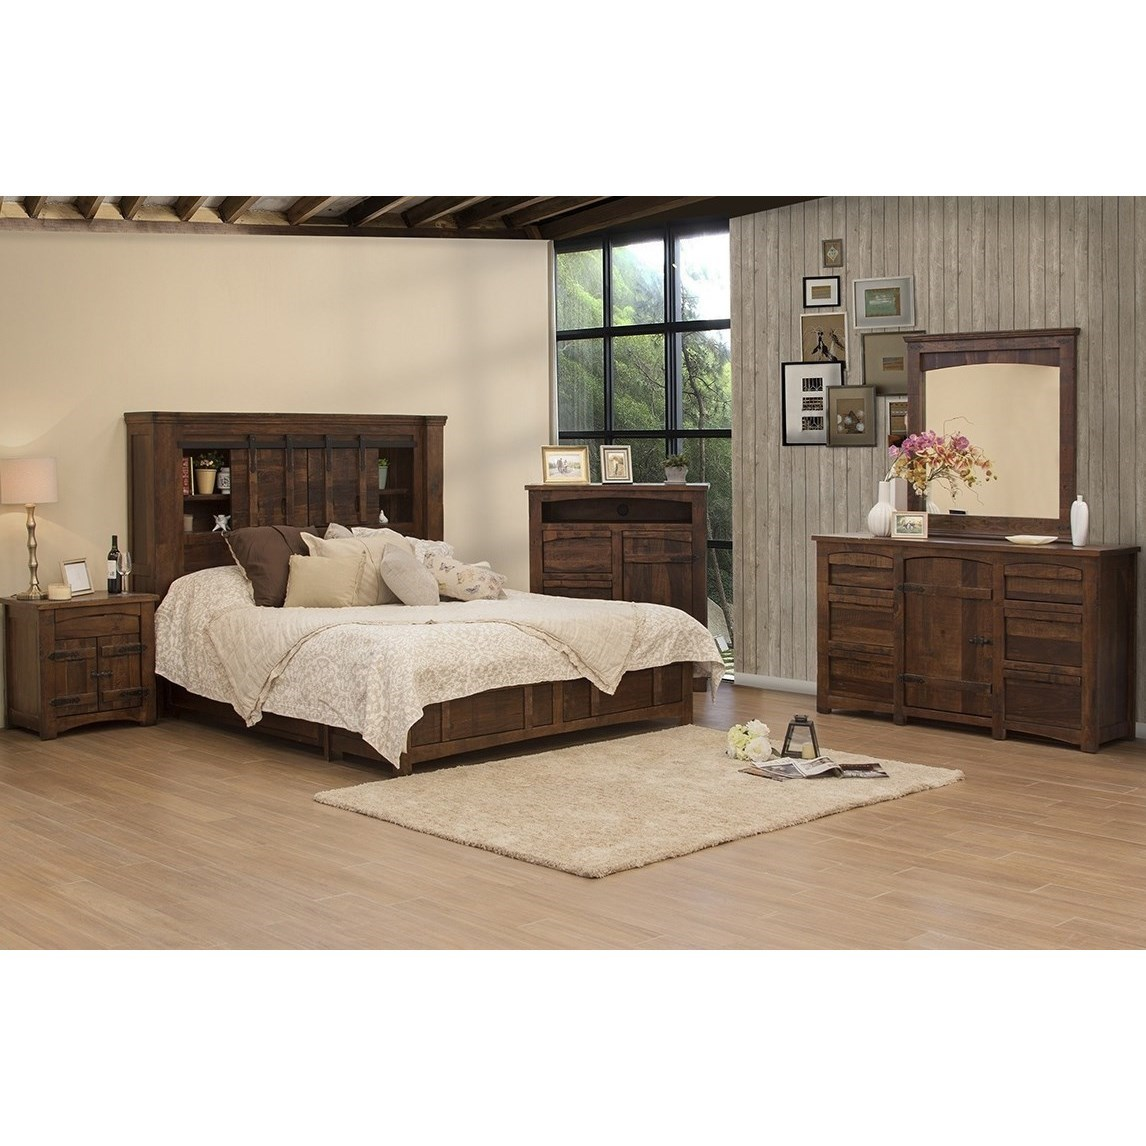 International Furniture Direct Mezcal Rustic King Storage